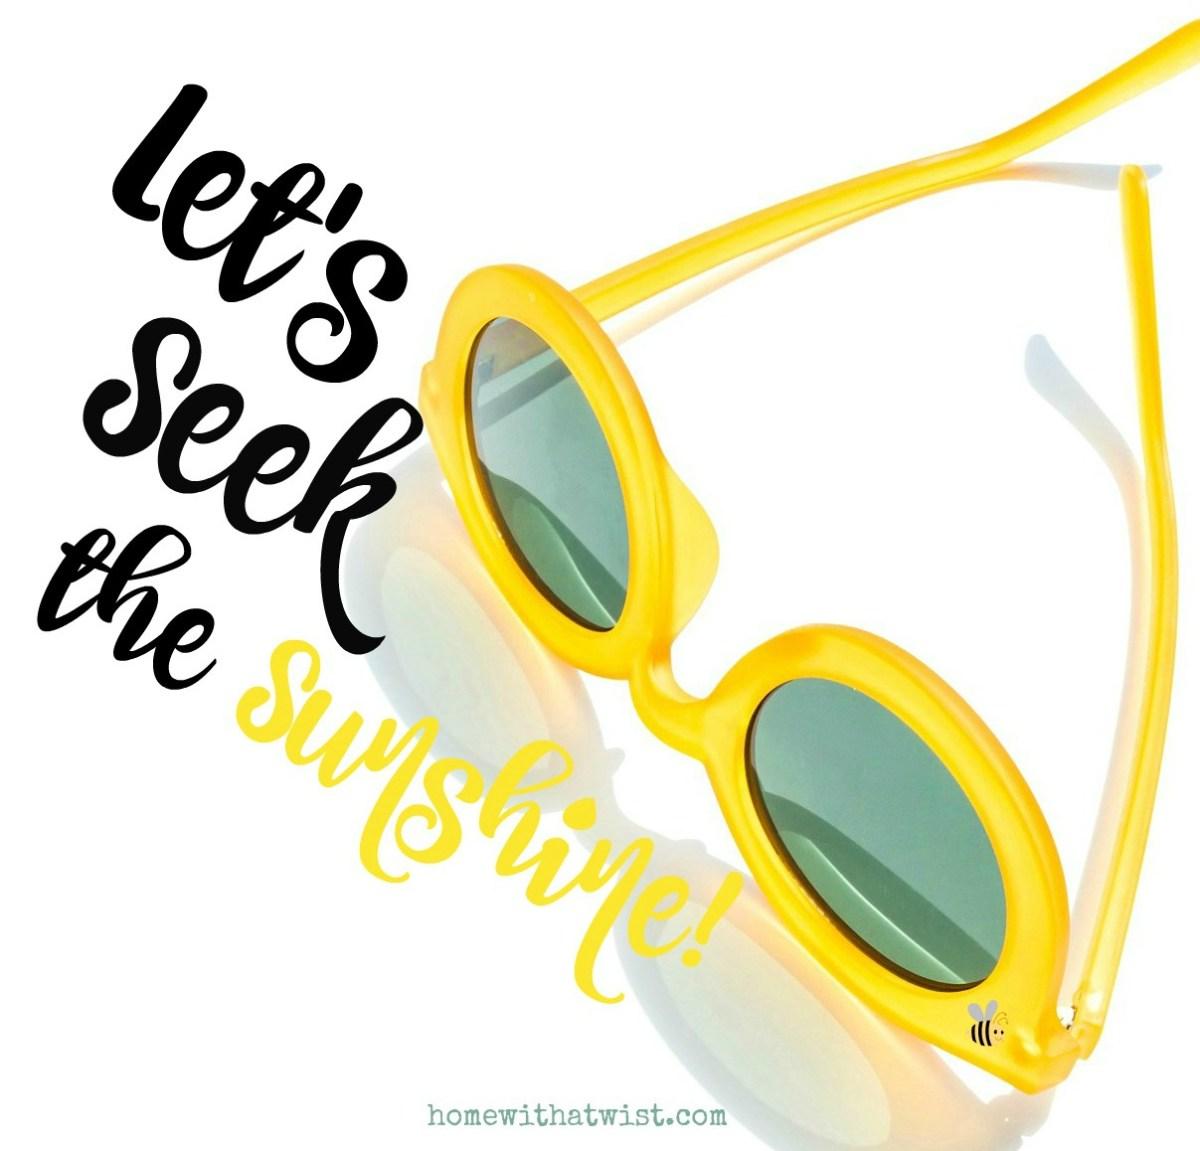 2019 Mantra – Seek My Sunshine!